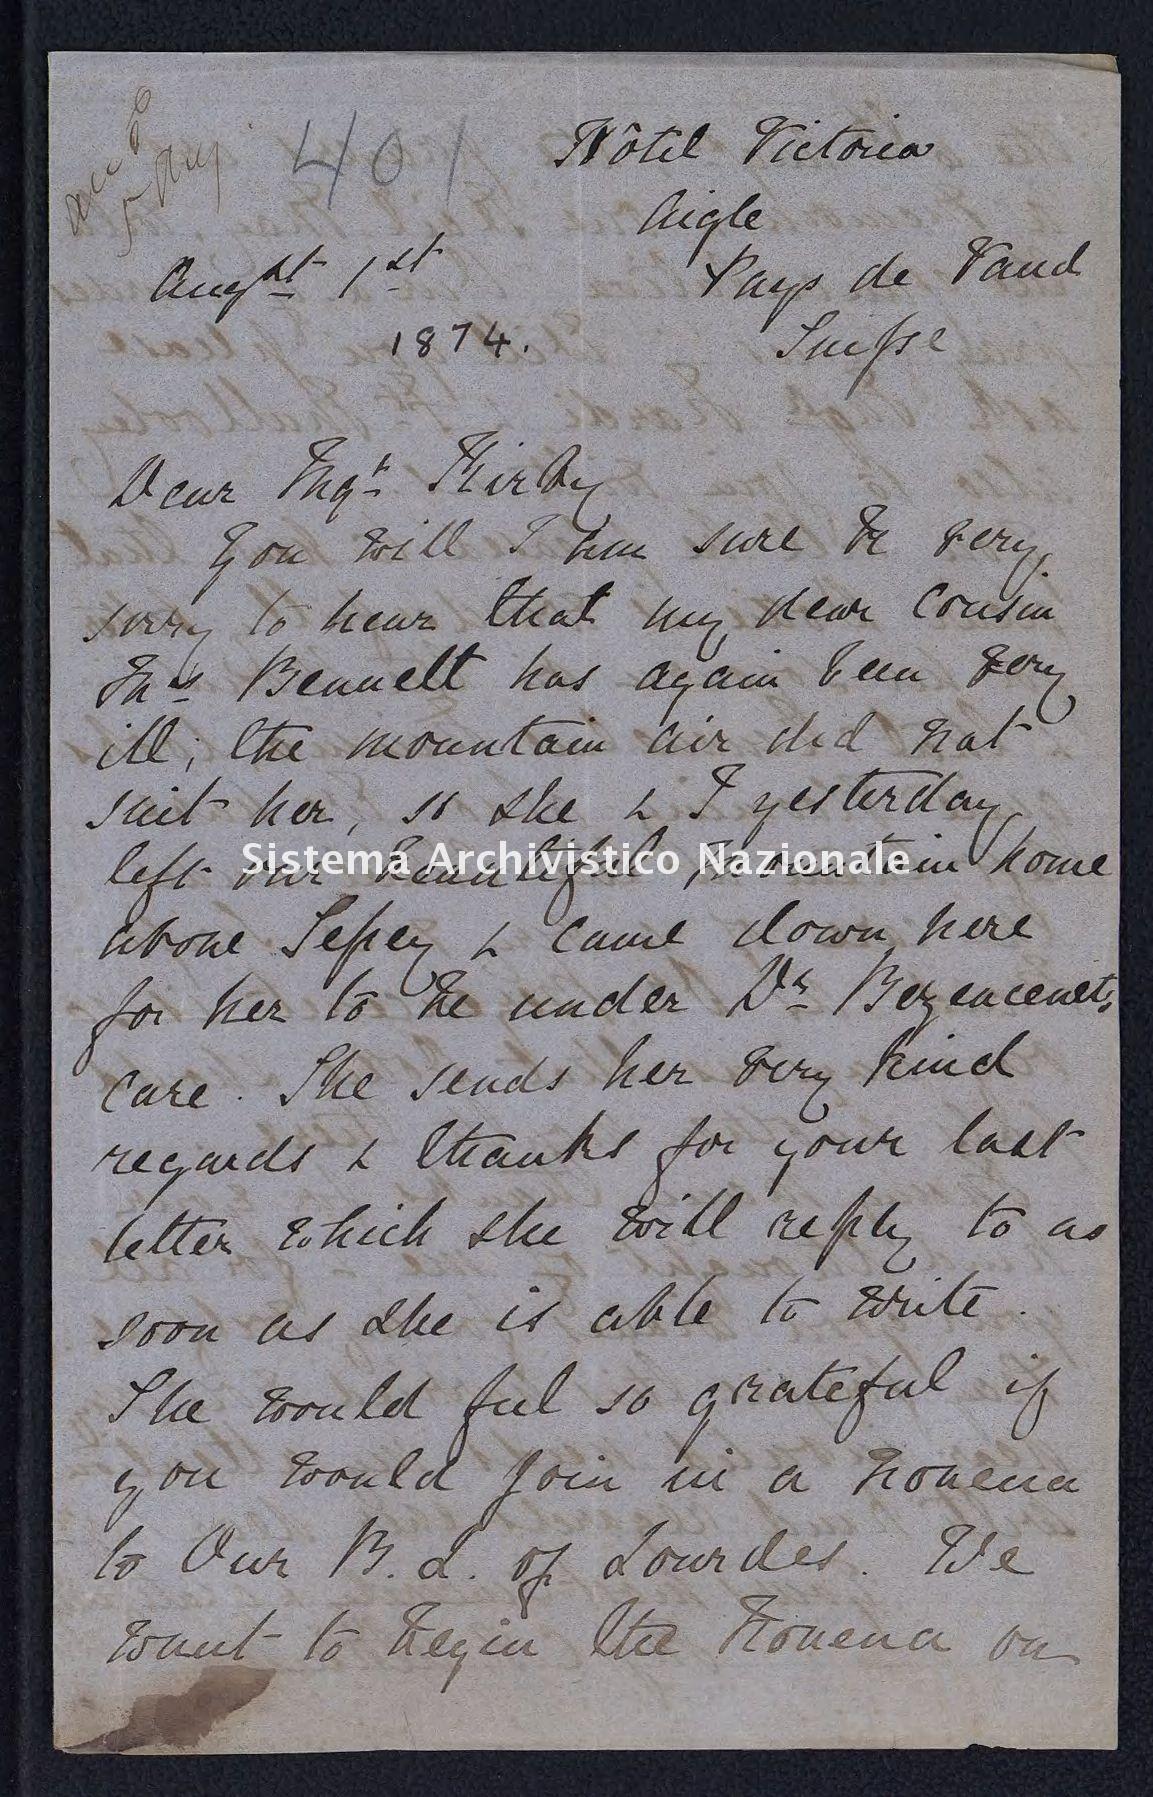 Pontificio Collegio Irlandese - Kirby_1874_401